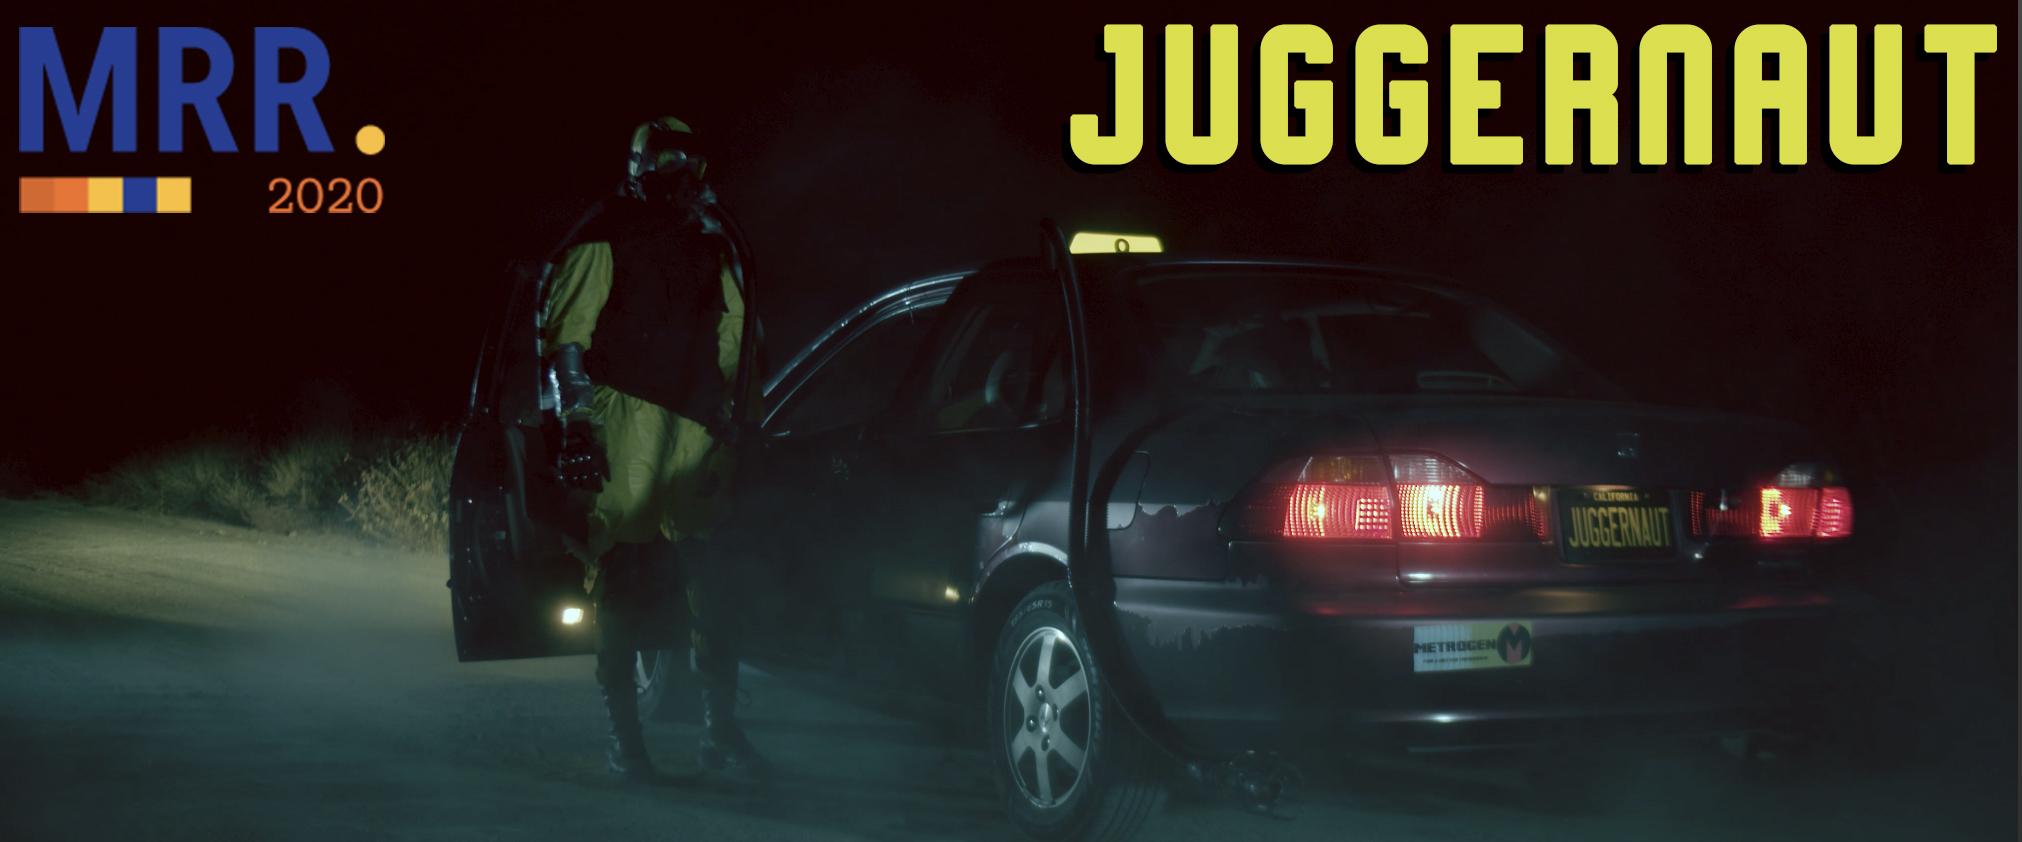 Juggernaut - MY RODE REEL 2020